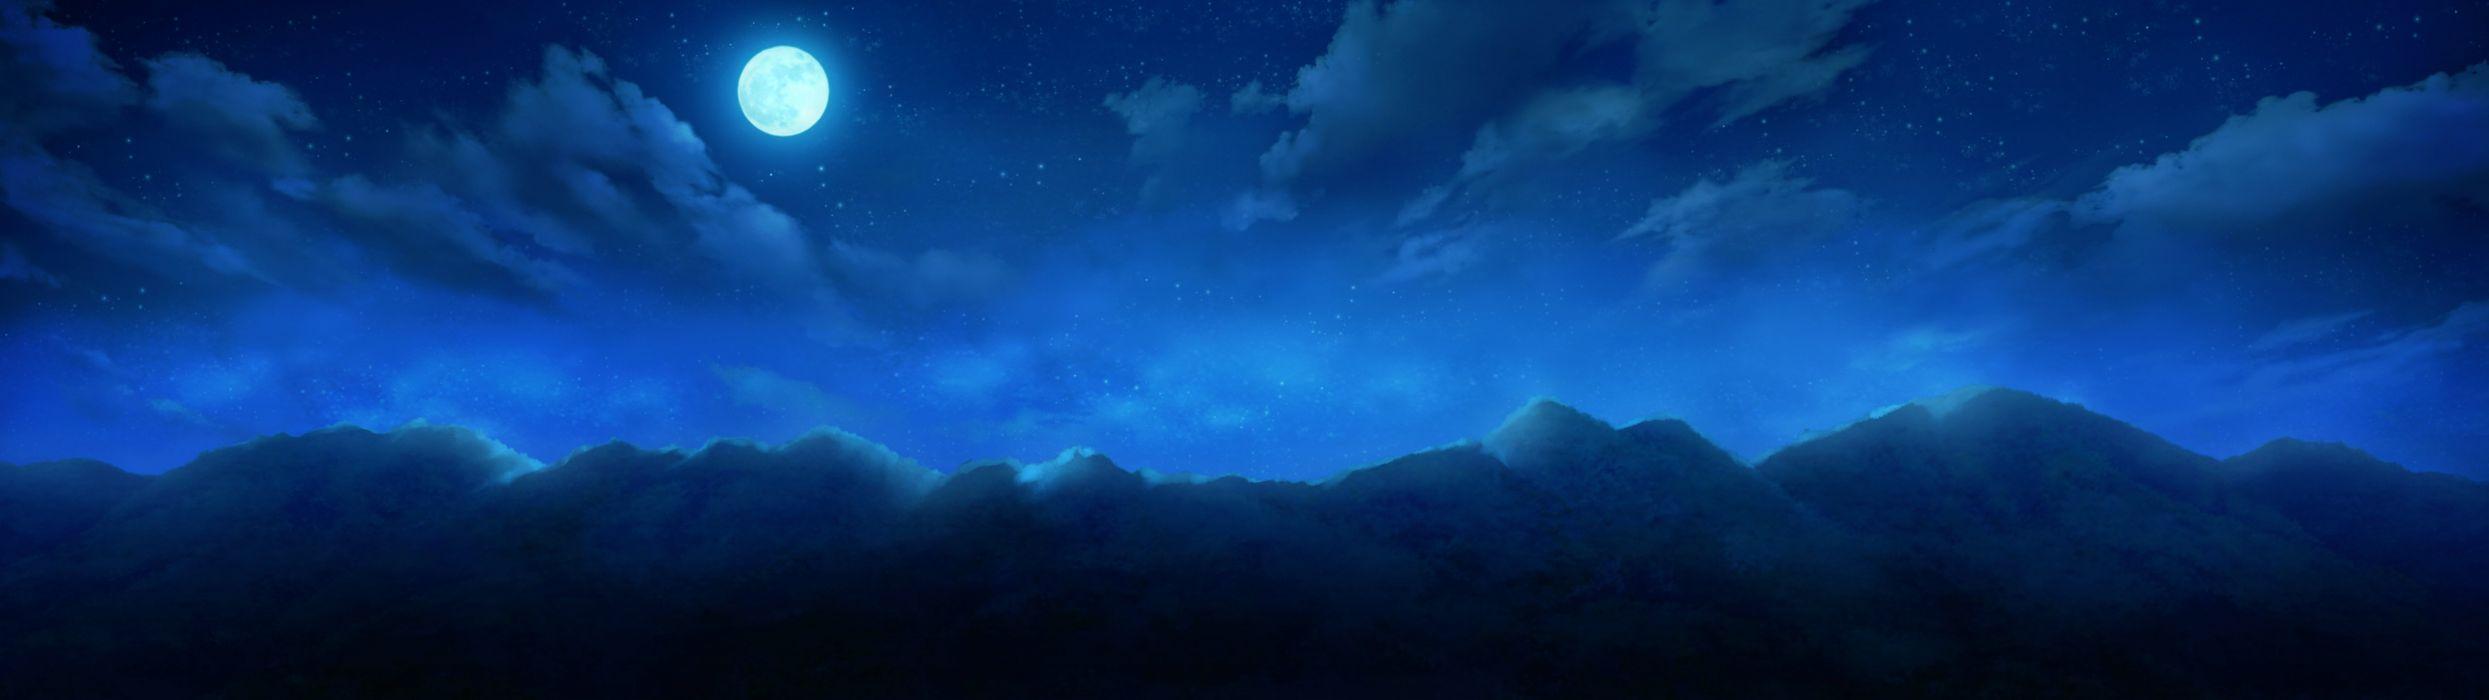 -monobeno-cura-highres-wide+image-game+cg-cloud+(clouds) wallpaper